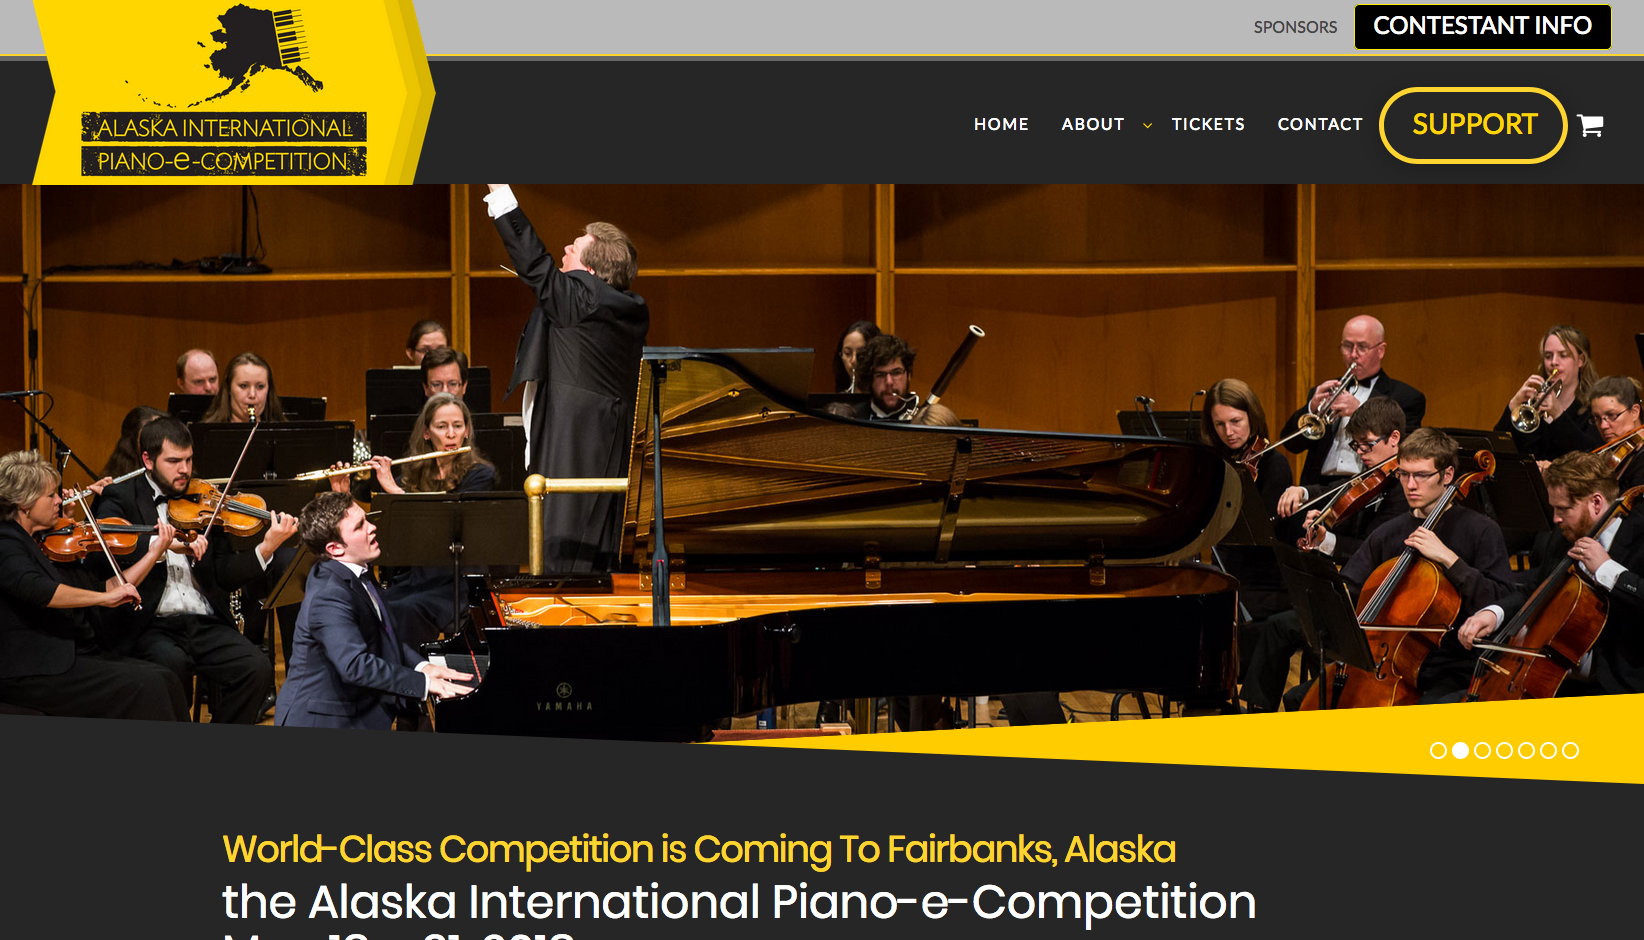 Alaska International Piano-e-Competition